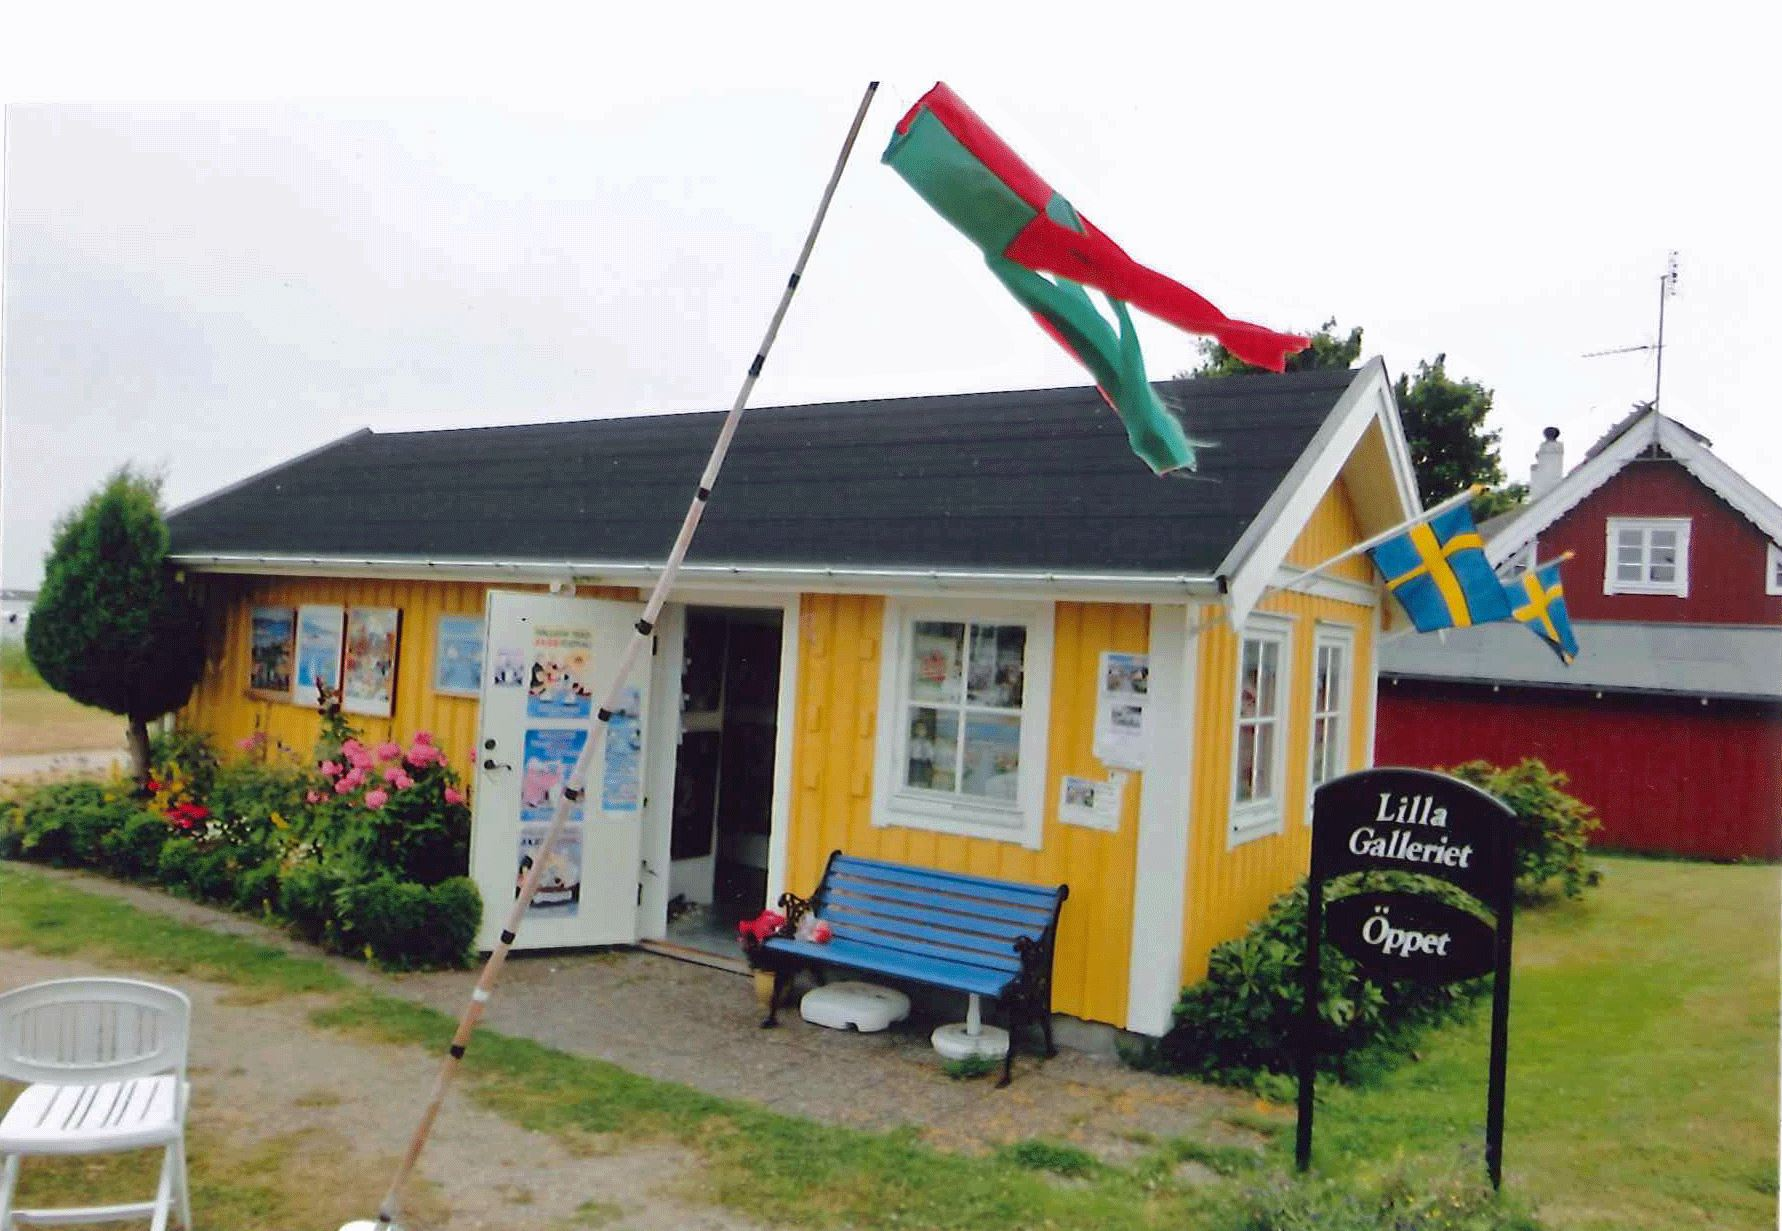 Ateljé Lilla Galleriet - Hällevik